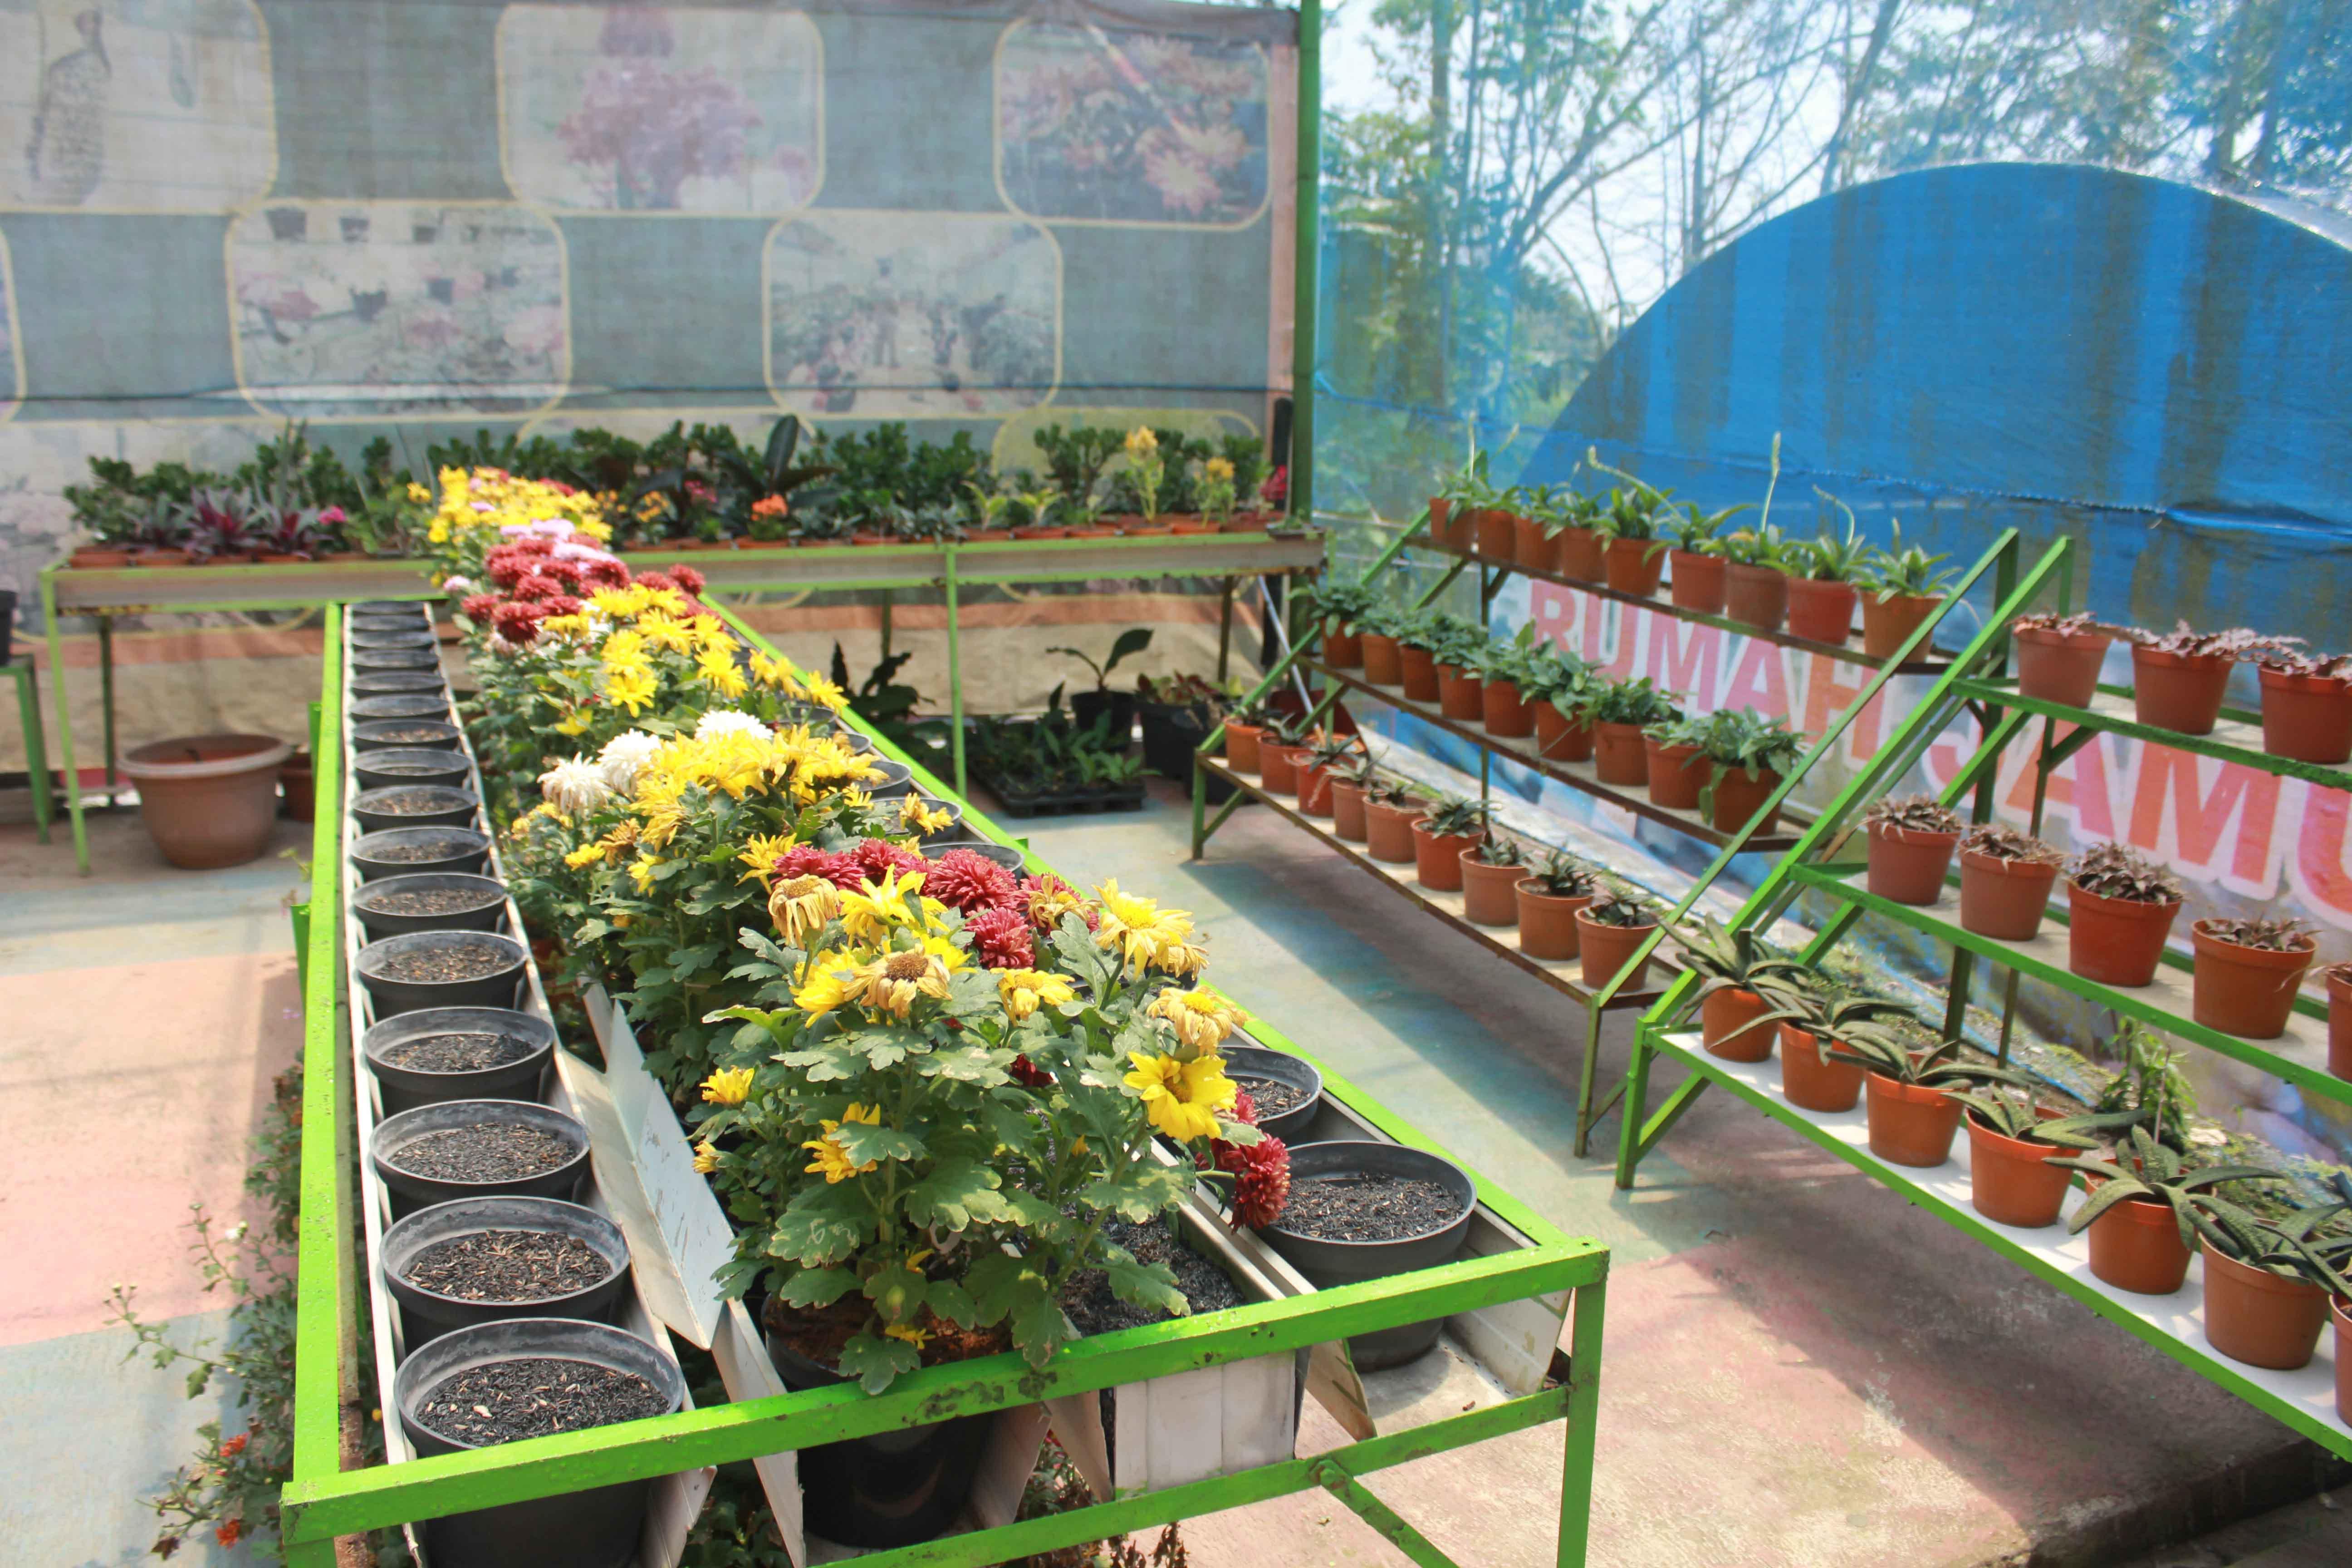 Wisata Bukit Flora Blog Museum Online Kabupaten Pasuruan Img 1784